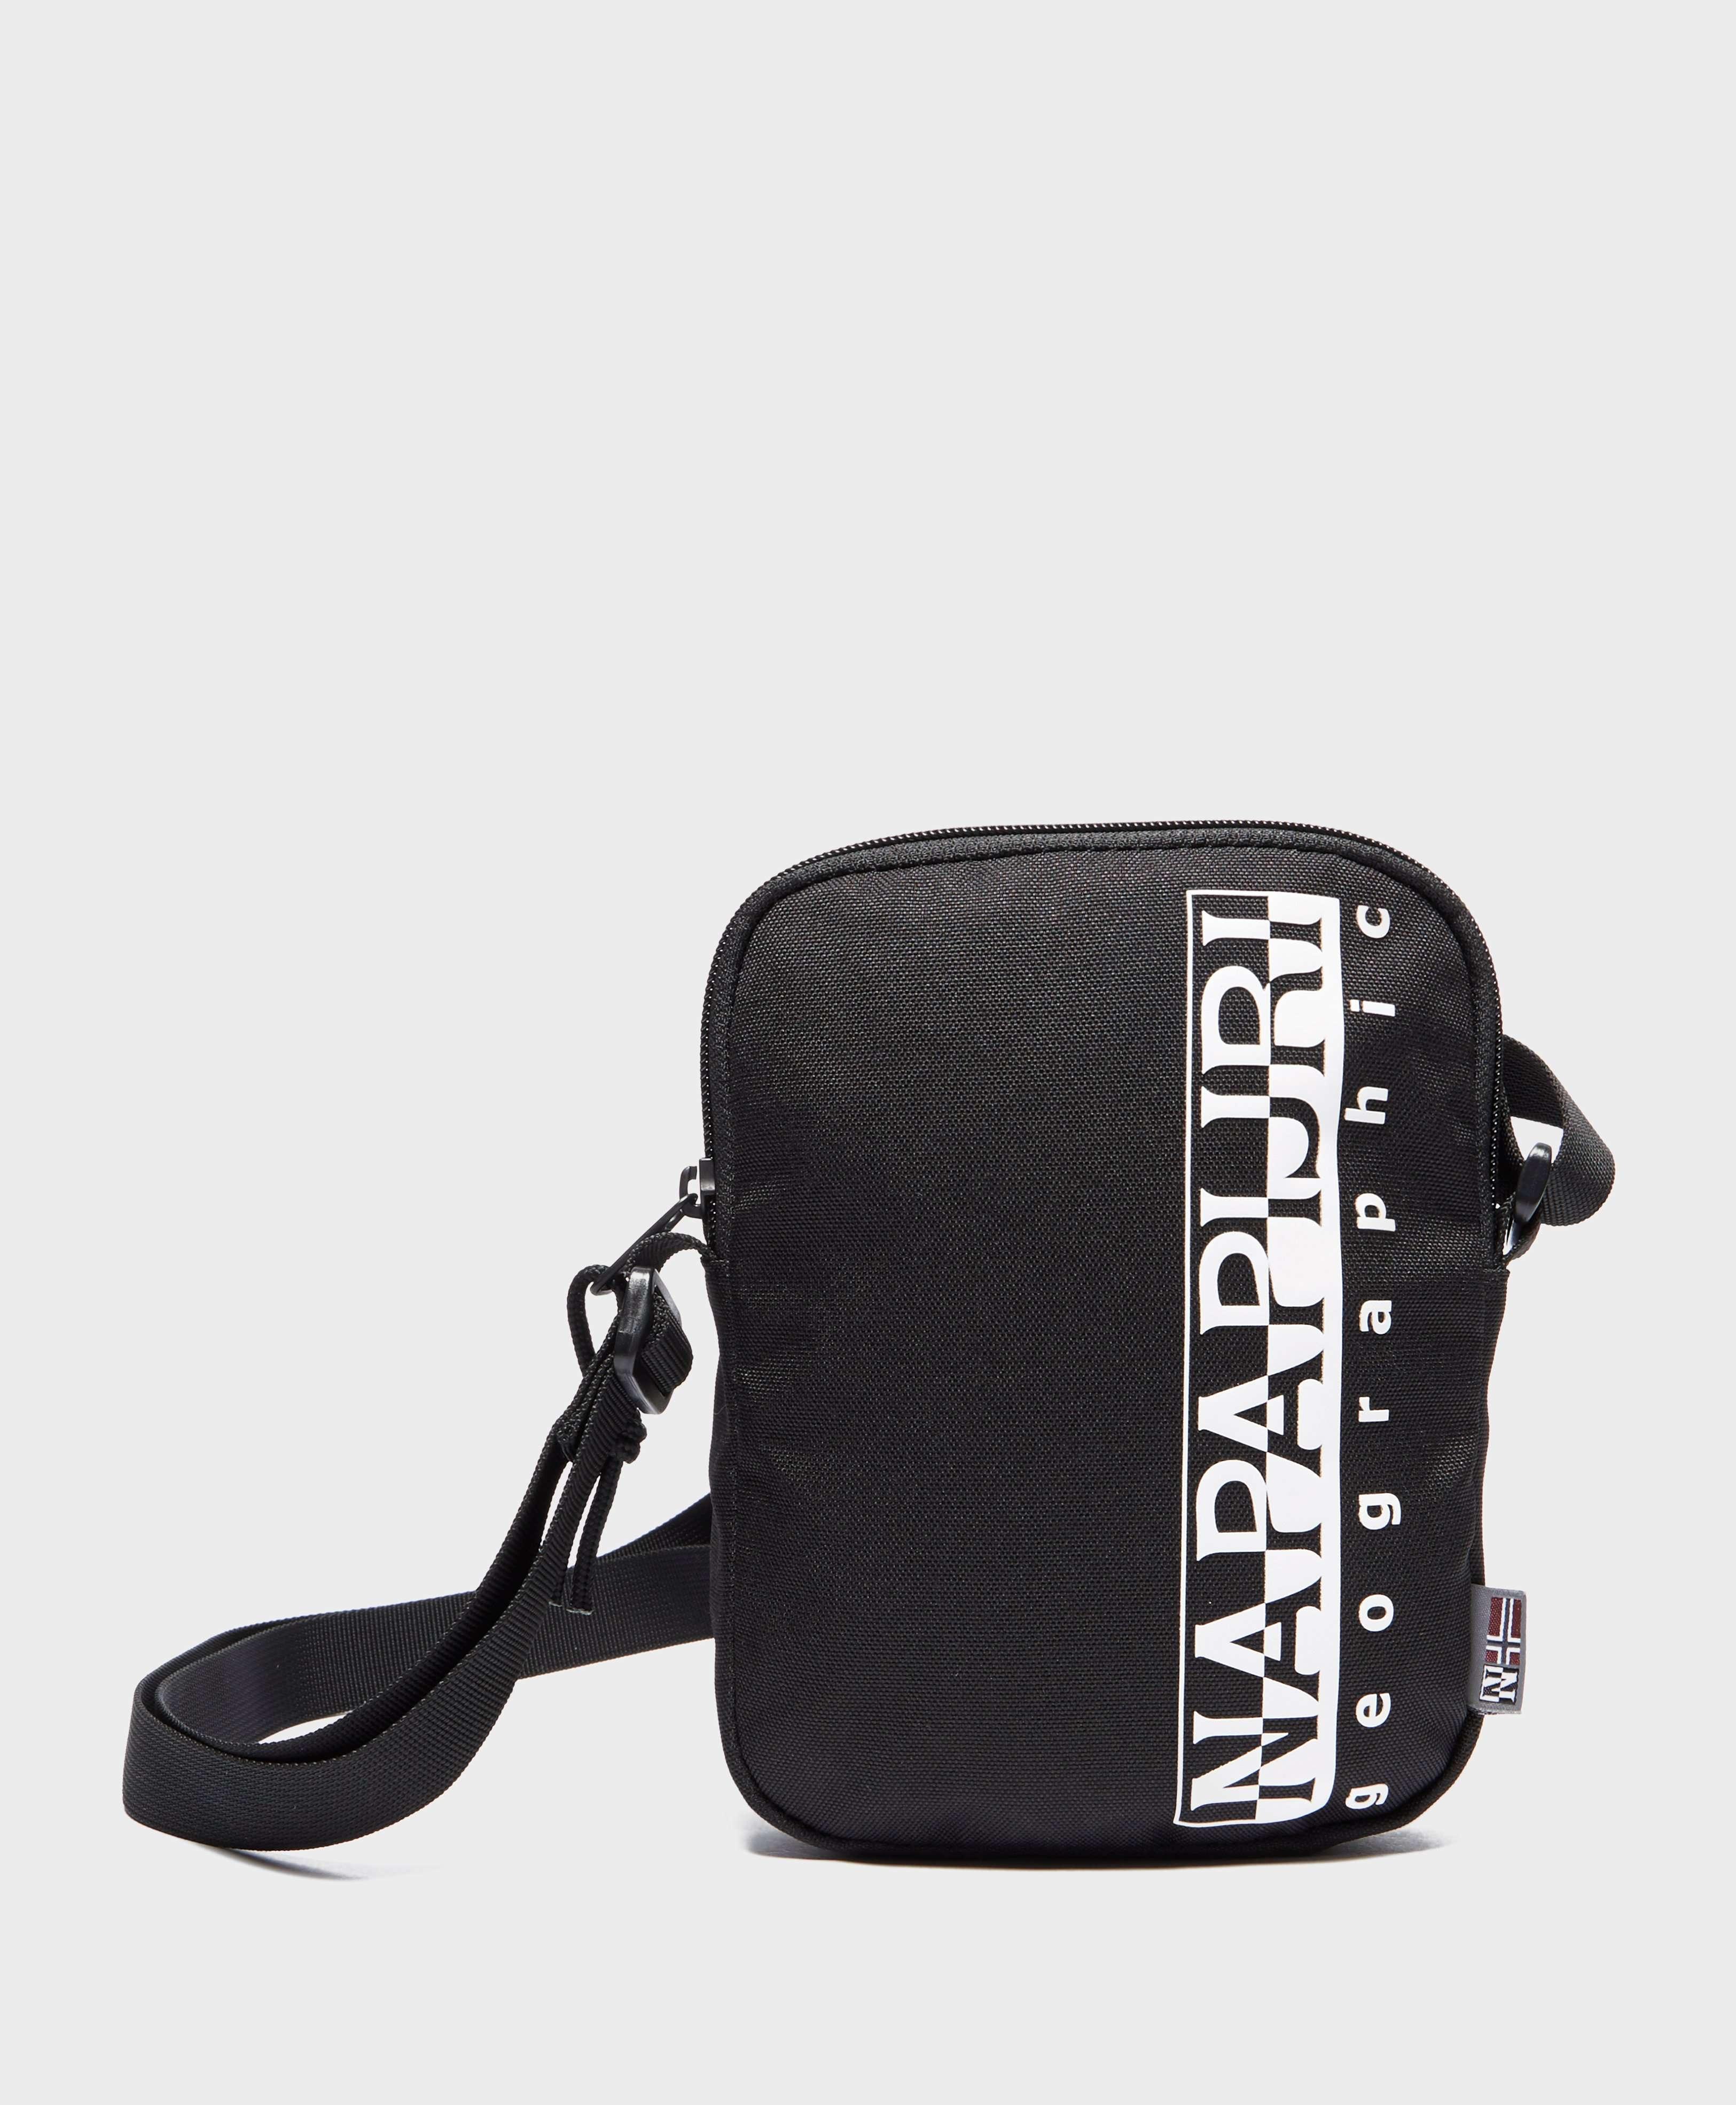 Napapijri Happy Day Small Item Bag - Online Exclusive